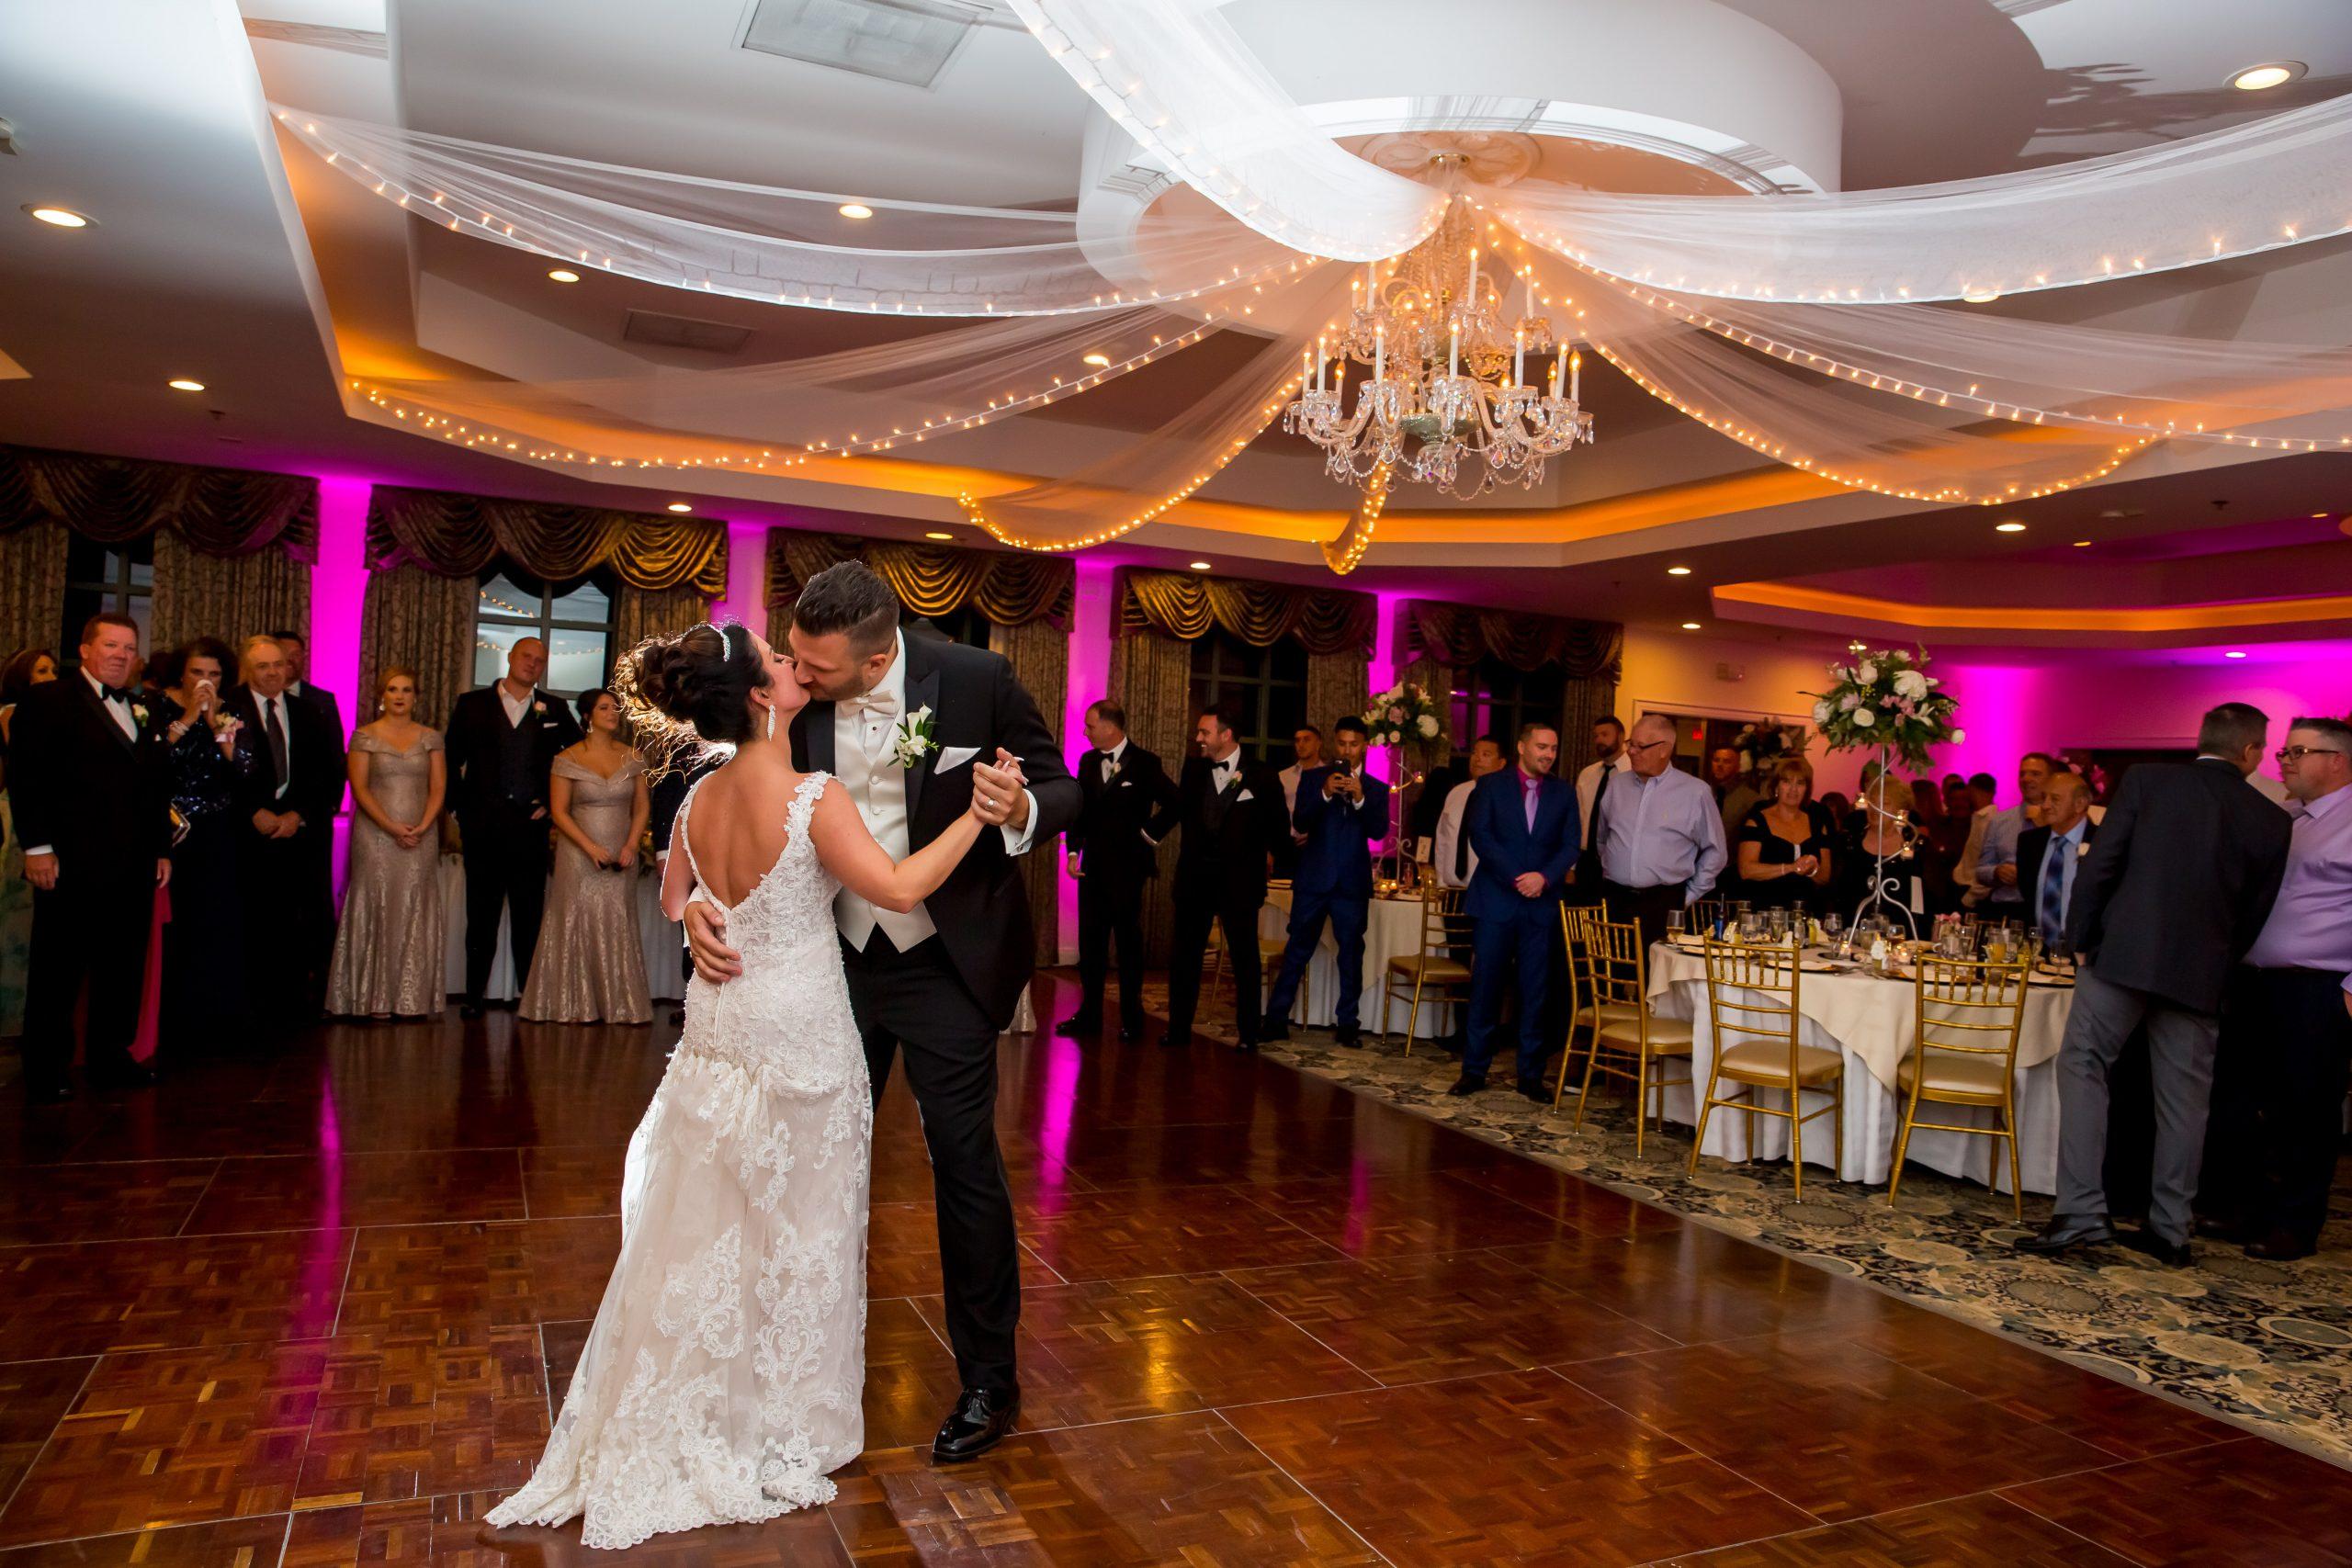 Victori_Rob_Mohawk River Country Club Wedding-51.jpg